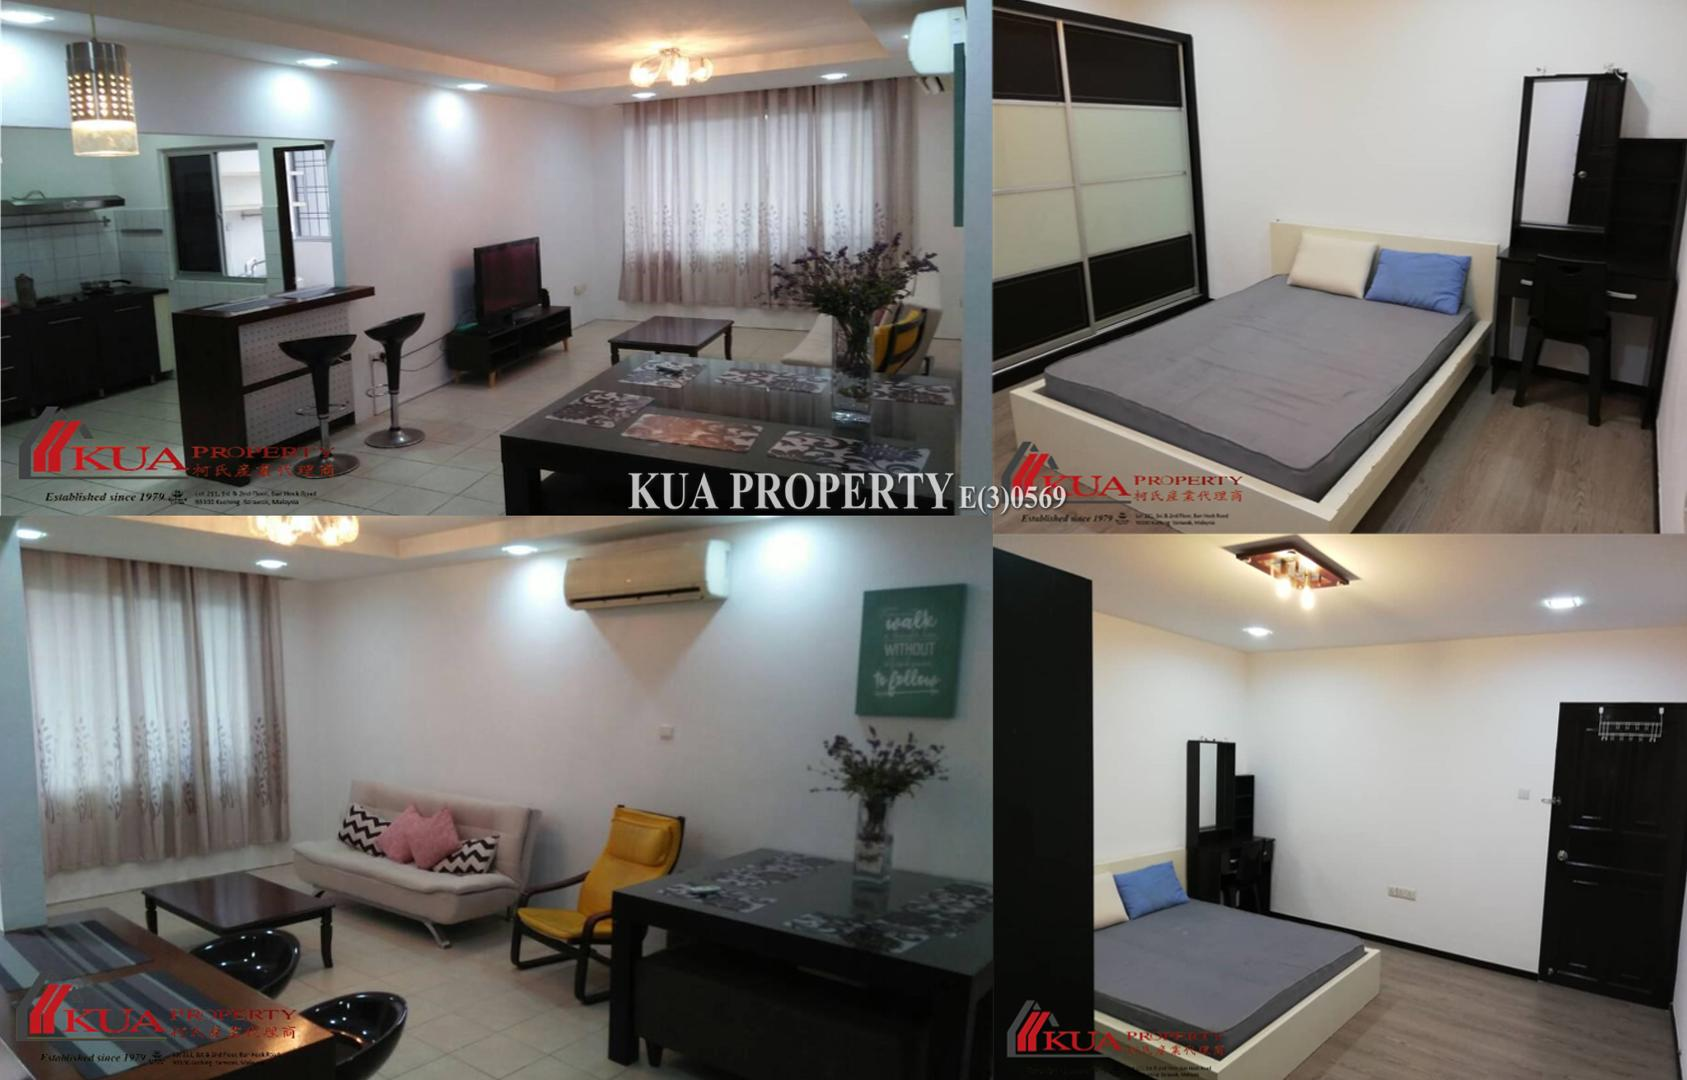 Floridale Condominium For Rent! at Jalan Wan Alwi